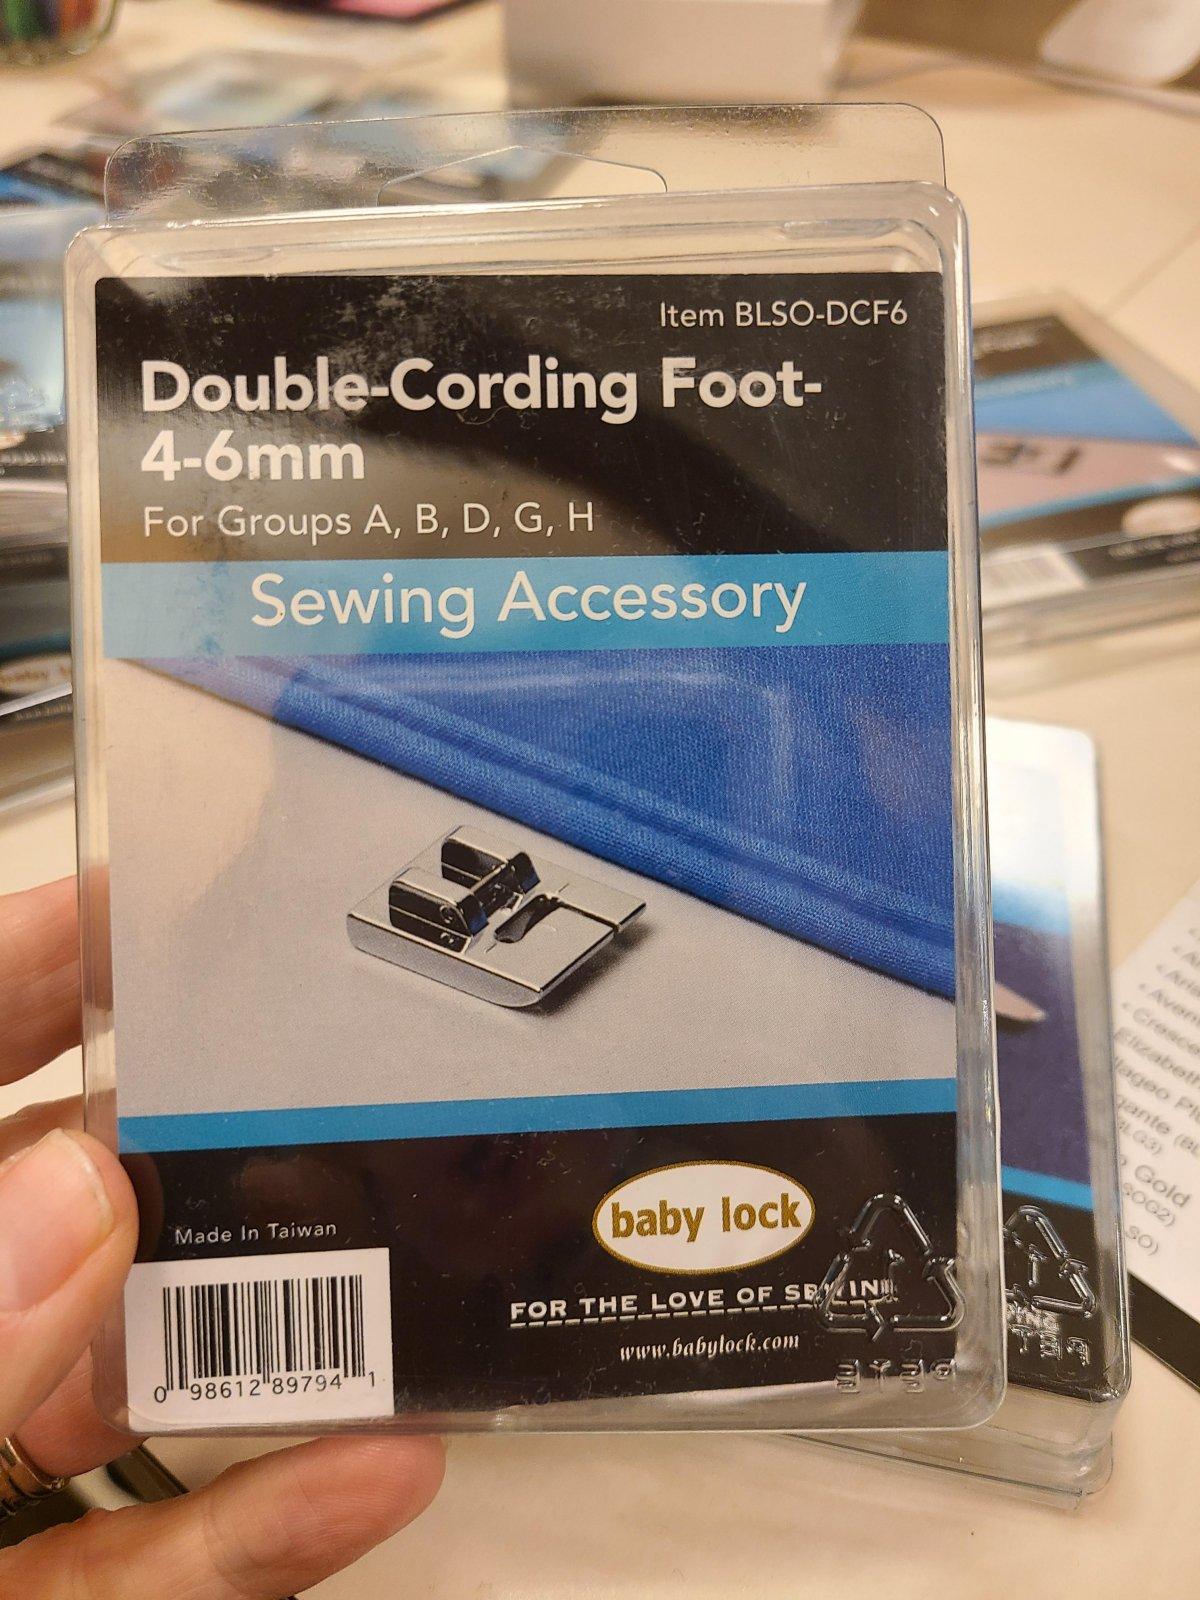 Baby Lock Double-Cording Foot 4-6 mm